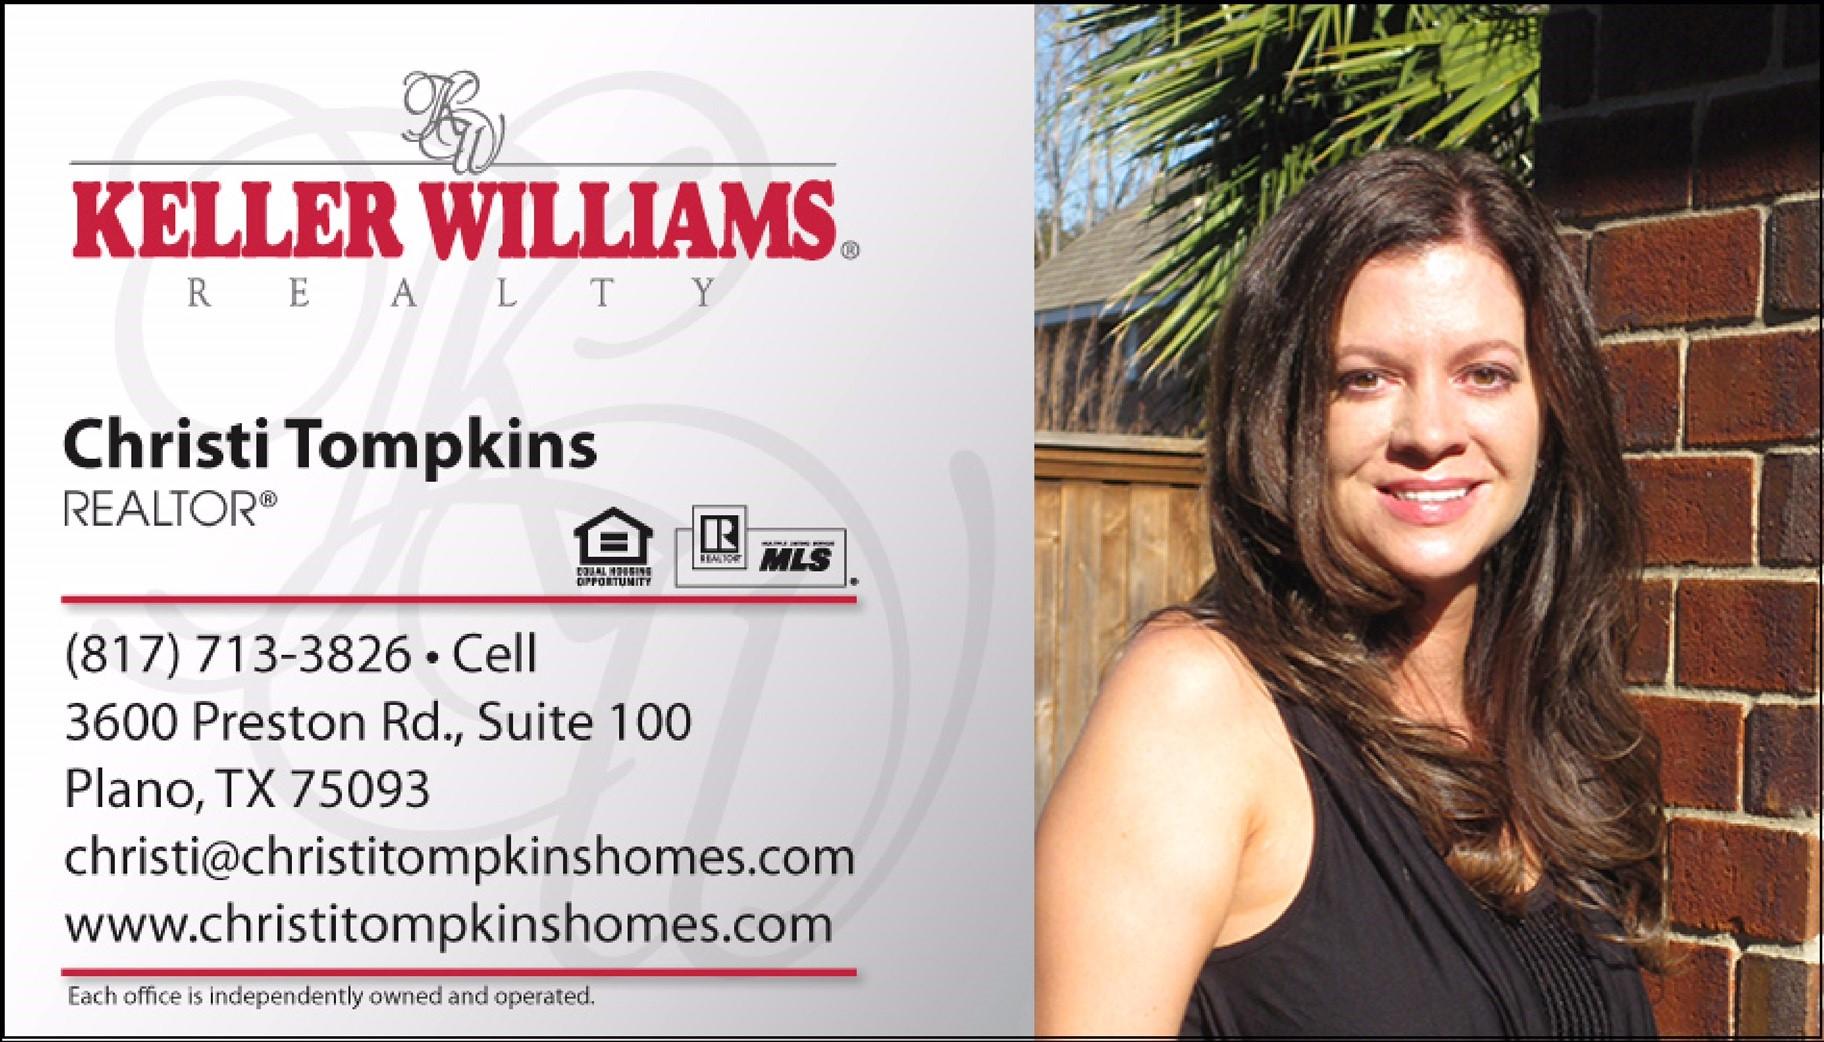 Christi Tompkins Business card.jpg